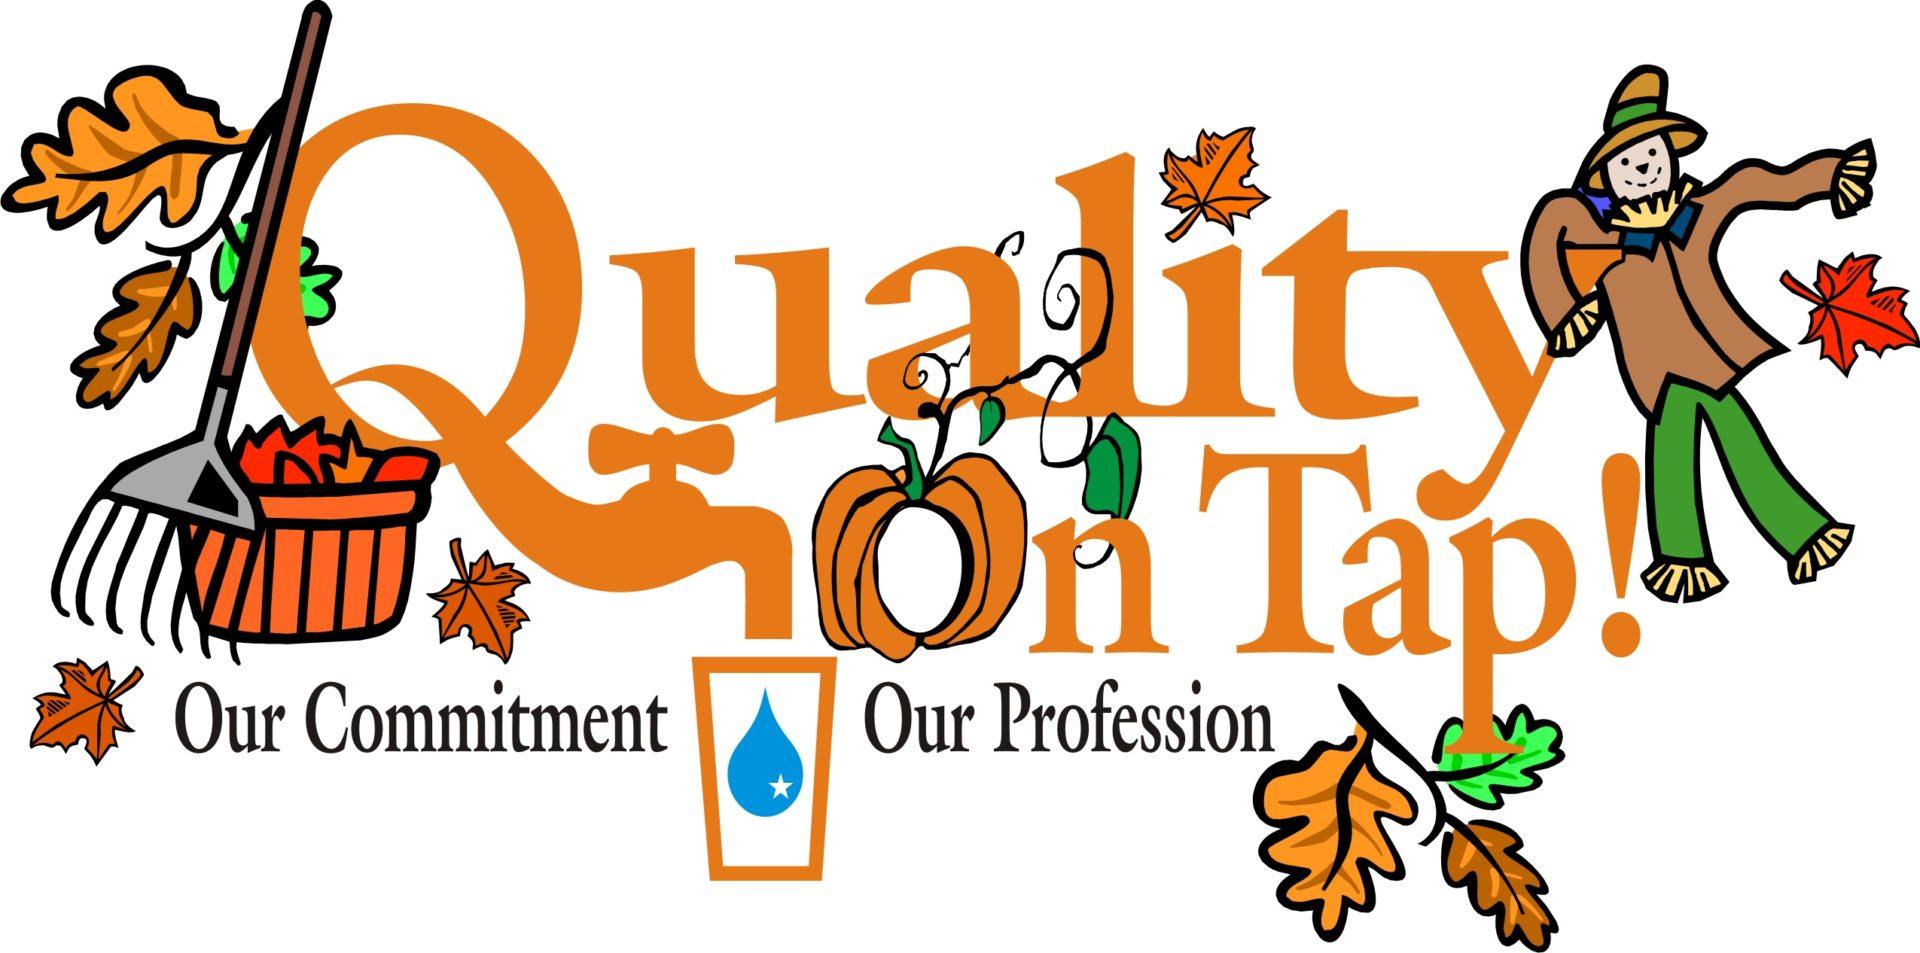 http://silvercreekwater.org/wp-content/uploads/2020/10/QOT-Fall-Logo-scaled.jpg